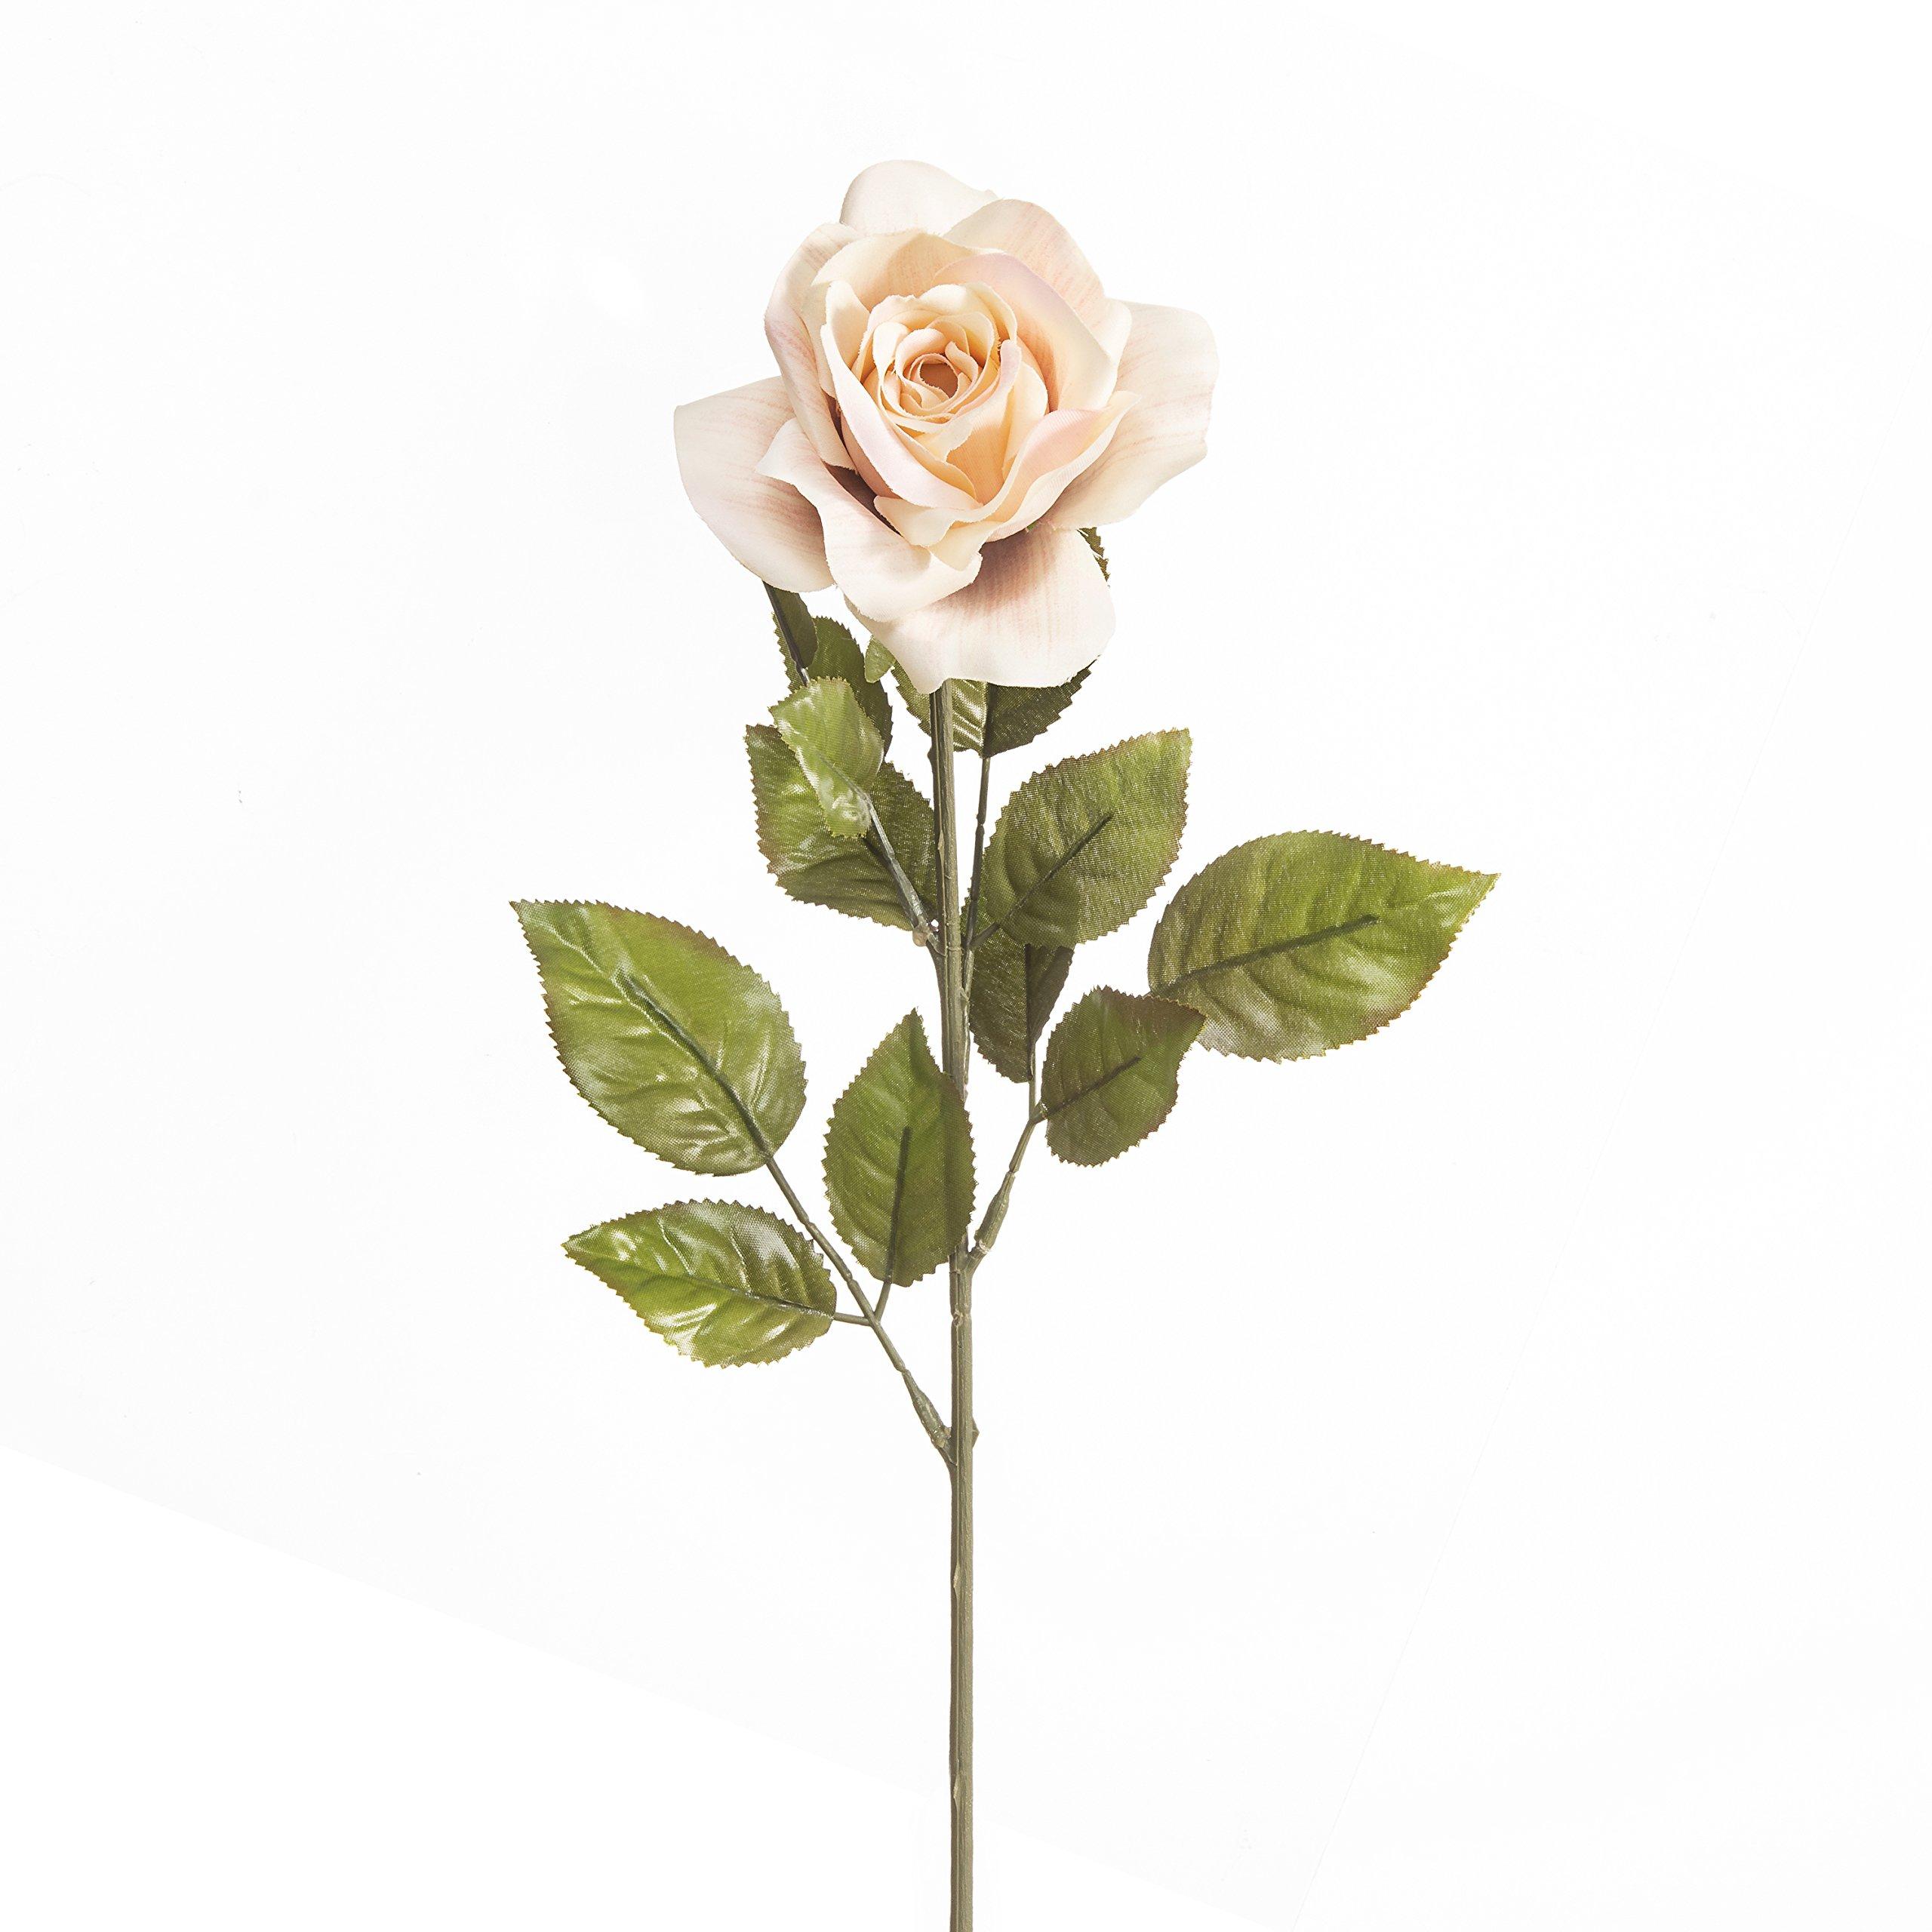 Darice 703475-702CRMV Everyday Long Stem Rose, 25'', Cream Mauve